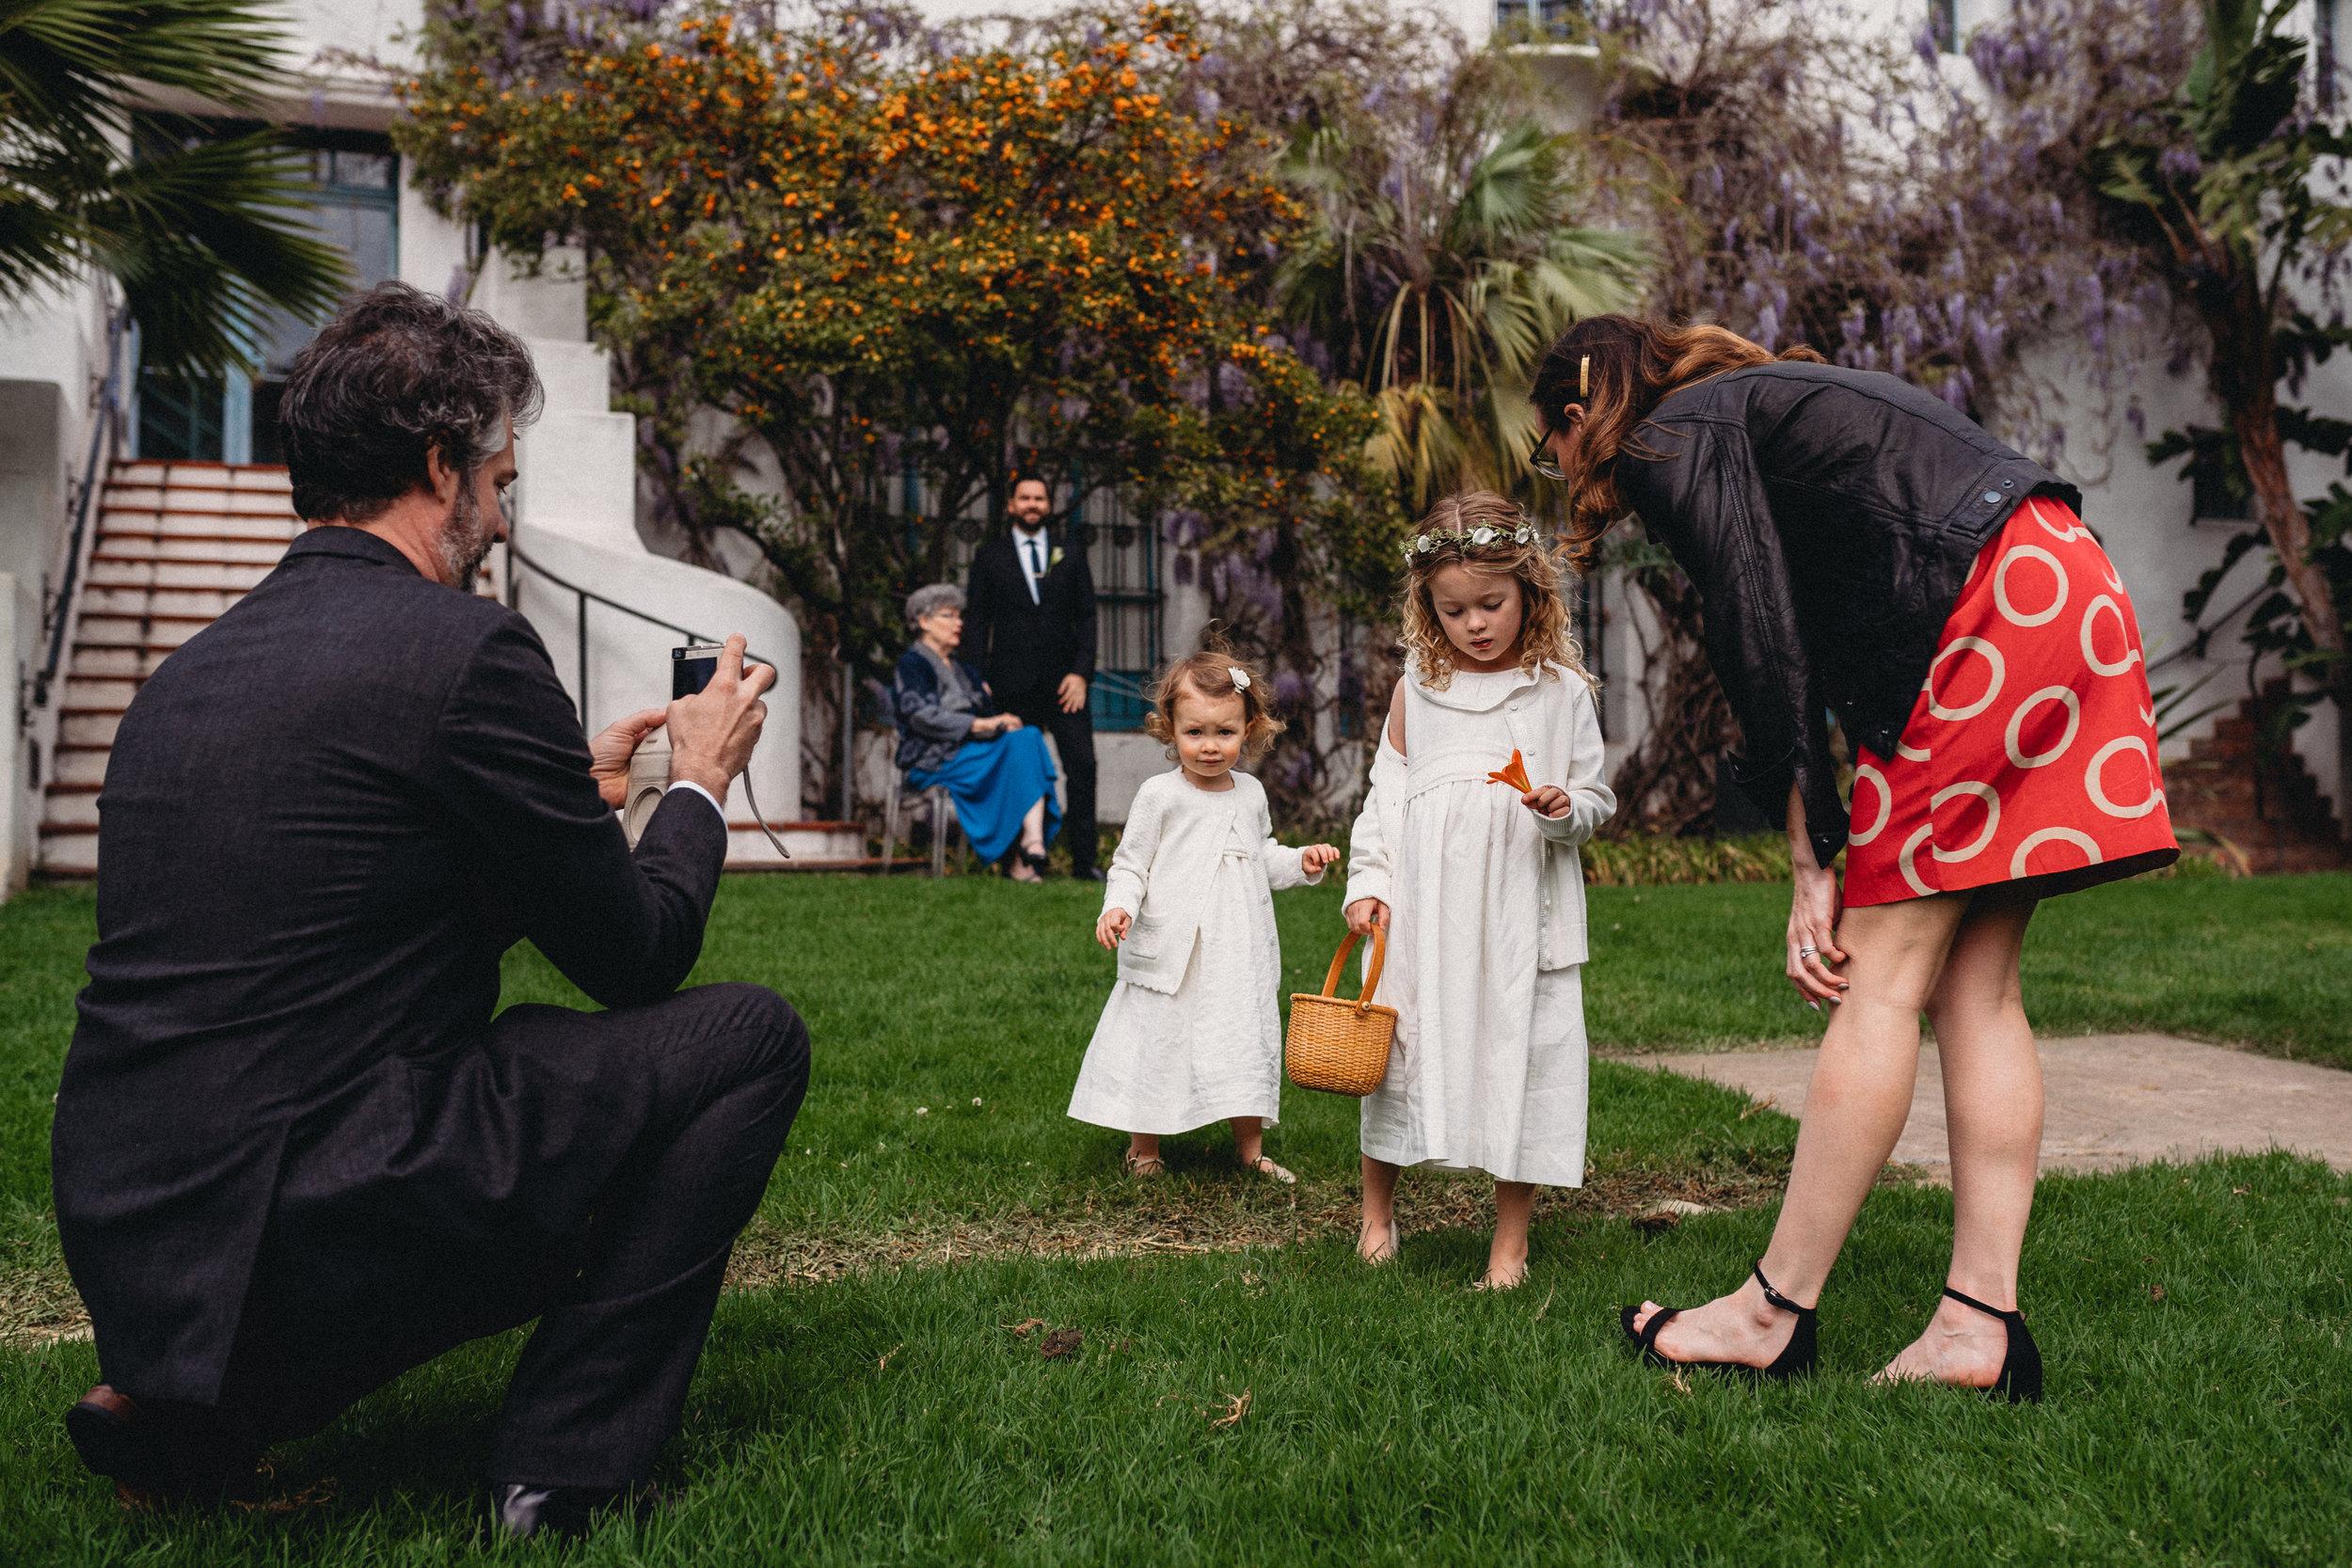 wedding-photography-santa-barbara-courthouse-rebeccaylasotras-12.jpg